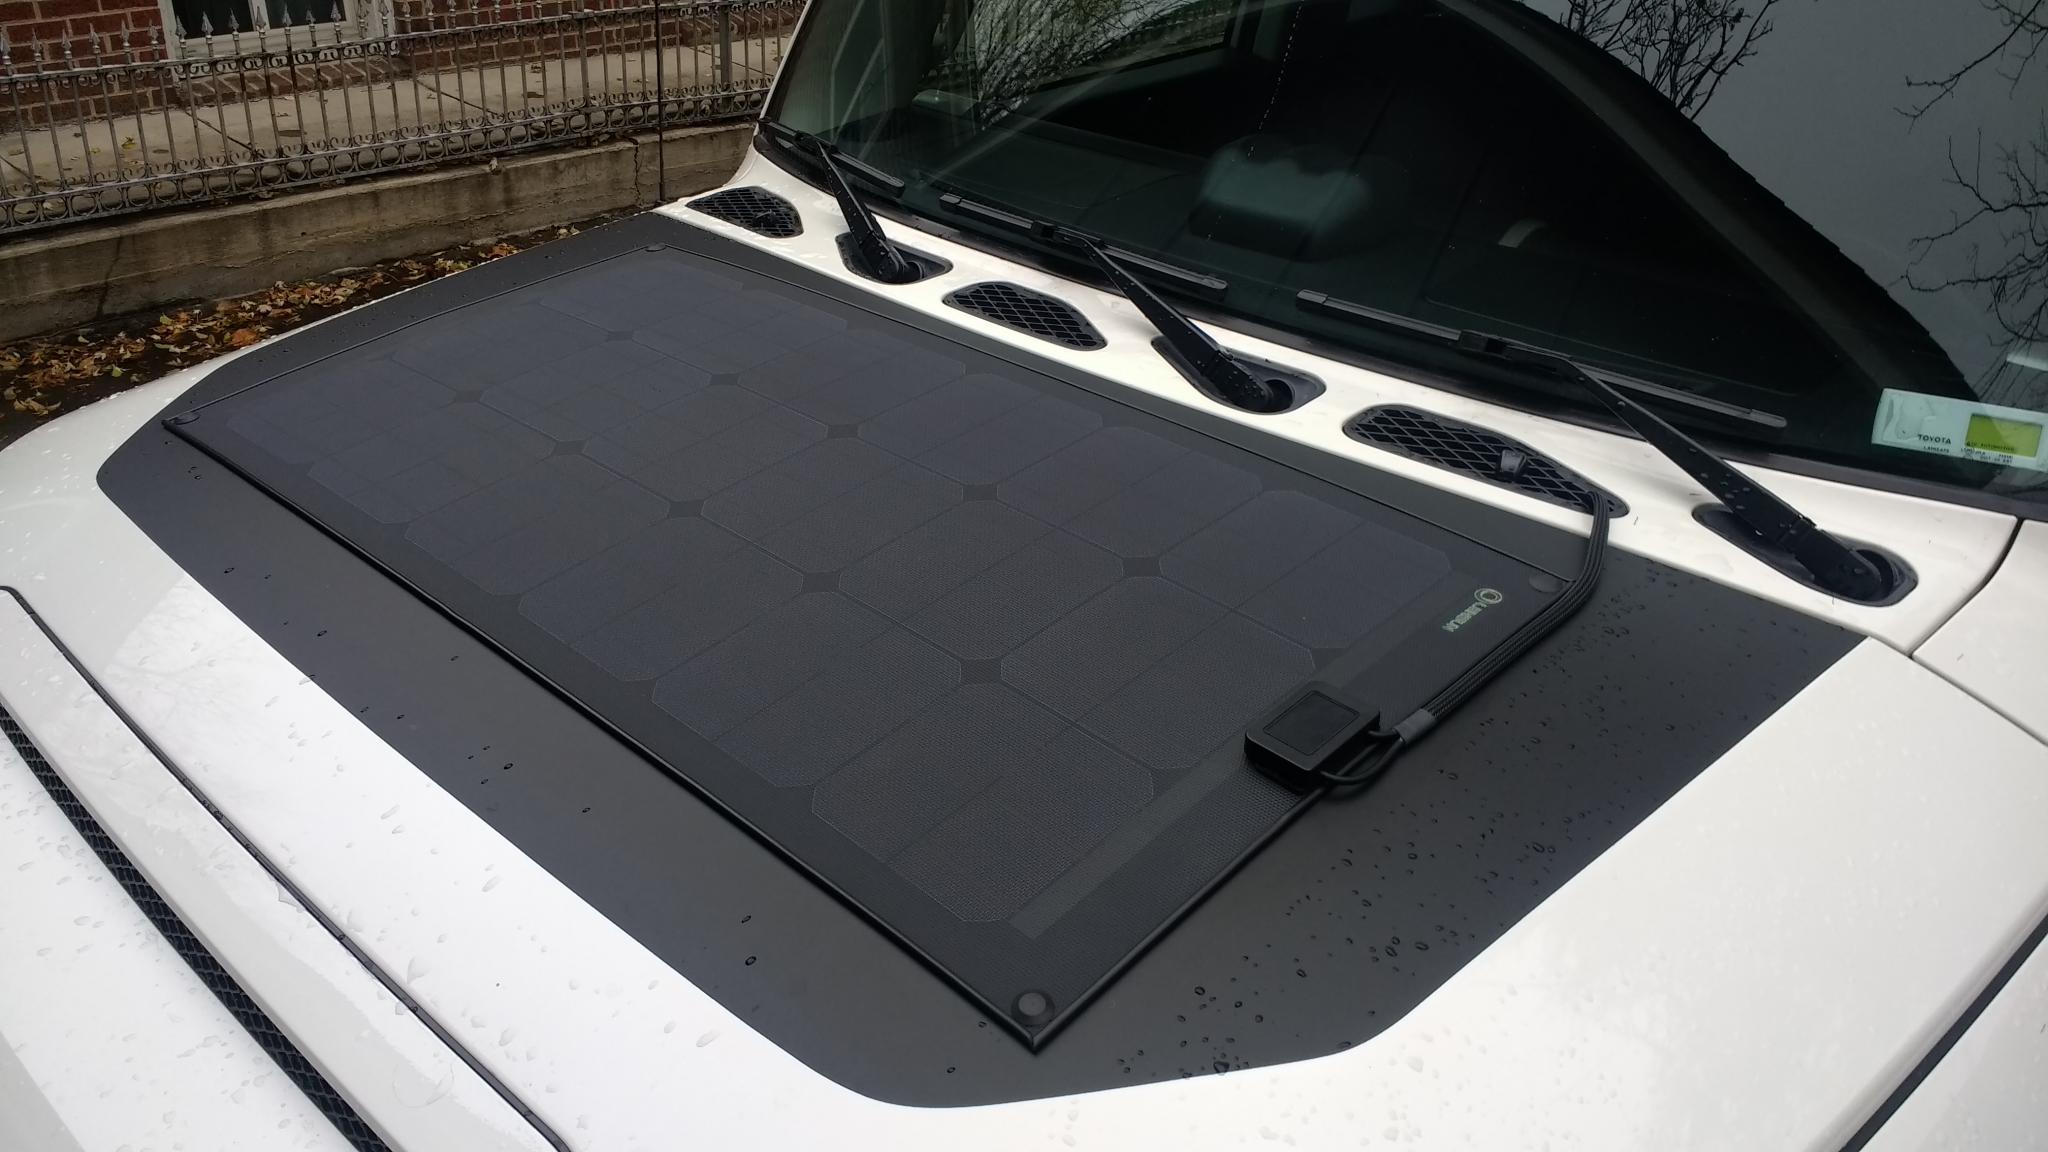 80w Lensun Flexible Solar Panel Mounted To Hood Toyota Fj Cruiser Car Click Image For Larger Version Name 4 Views 1177 Size 2099